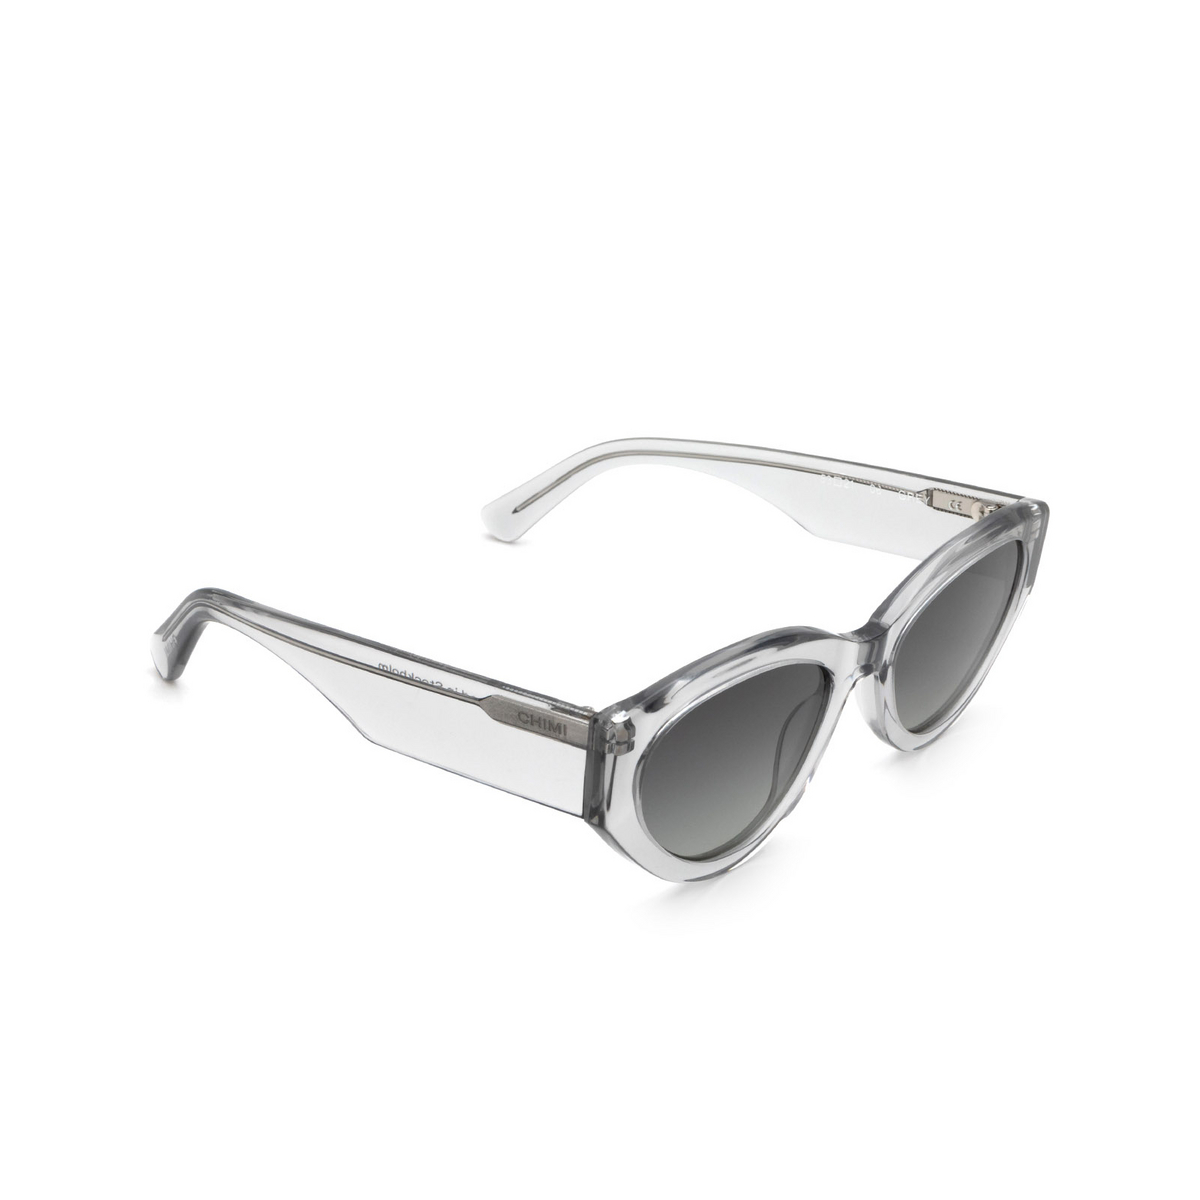 Chimi® Cat-eye Sunglasses: 06 color Grey - three-quarters view.